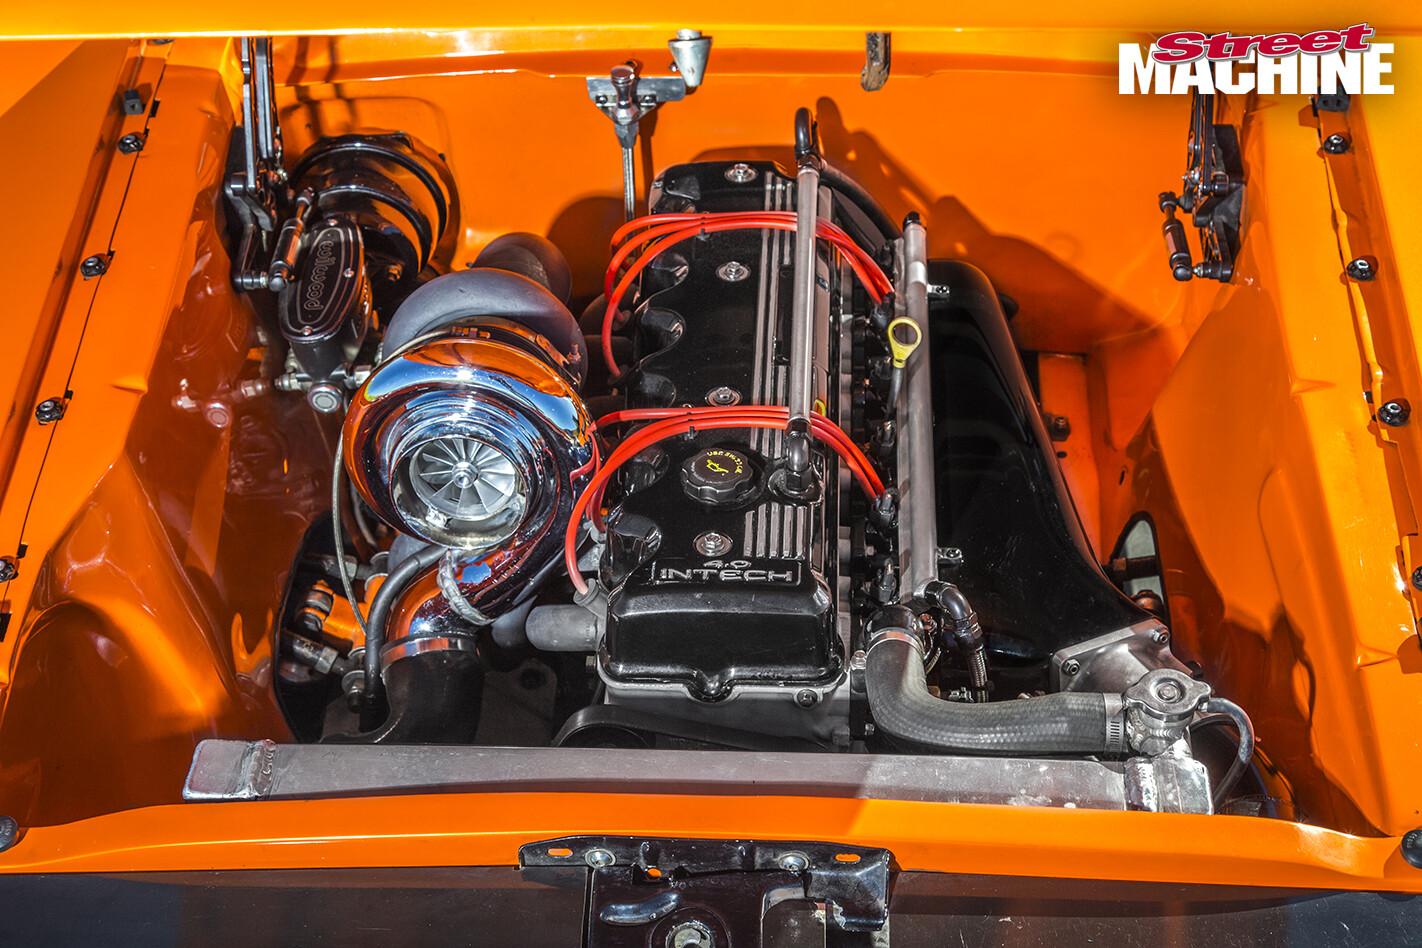 Turbo INTEC Six